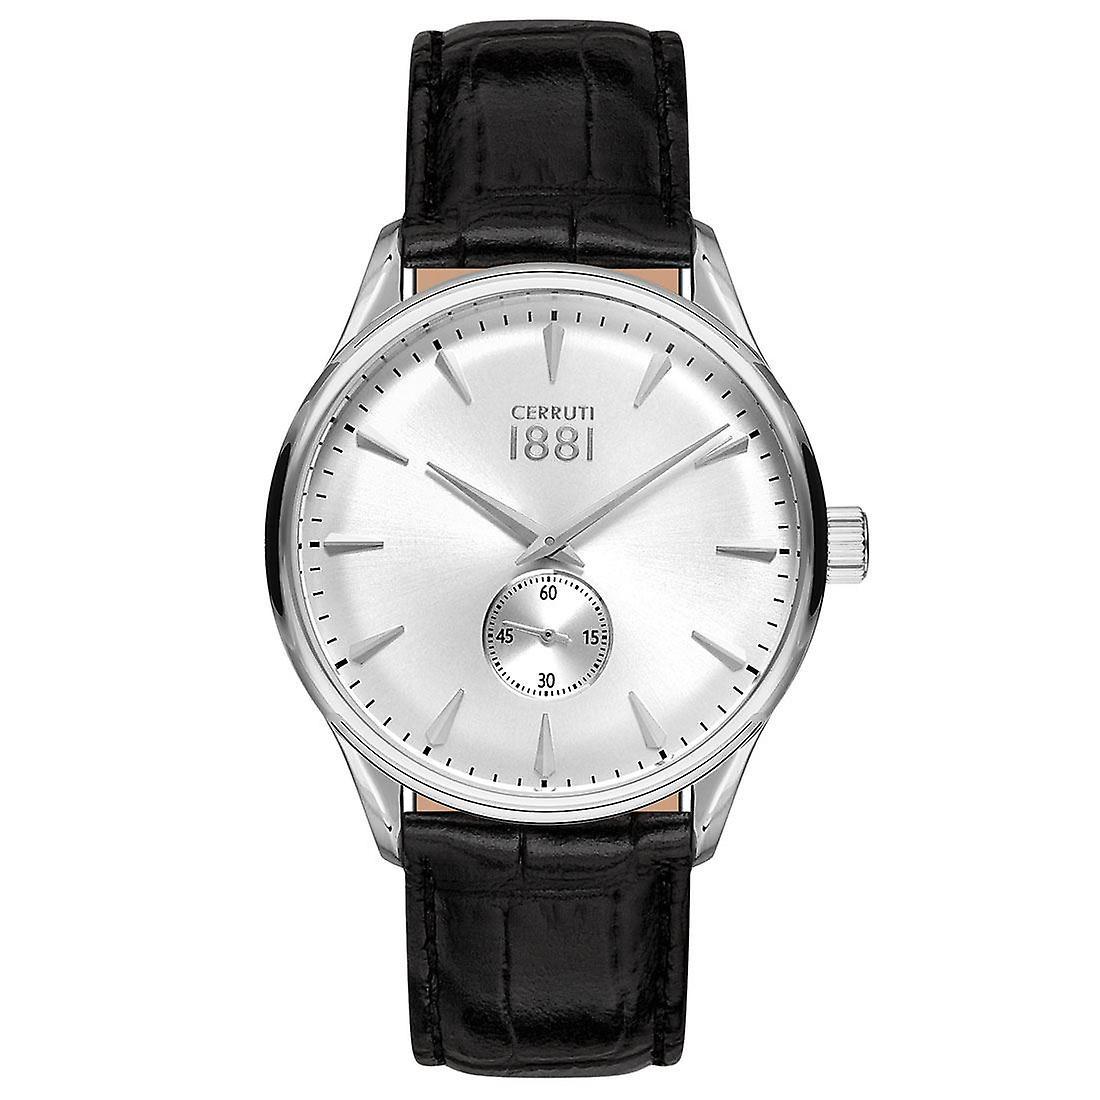 Cerruti 1881 Mens Gents Noir et Argent Designer Wrist Watch CRA24005